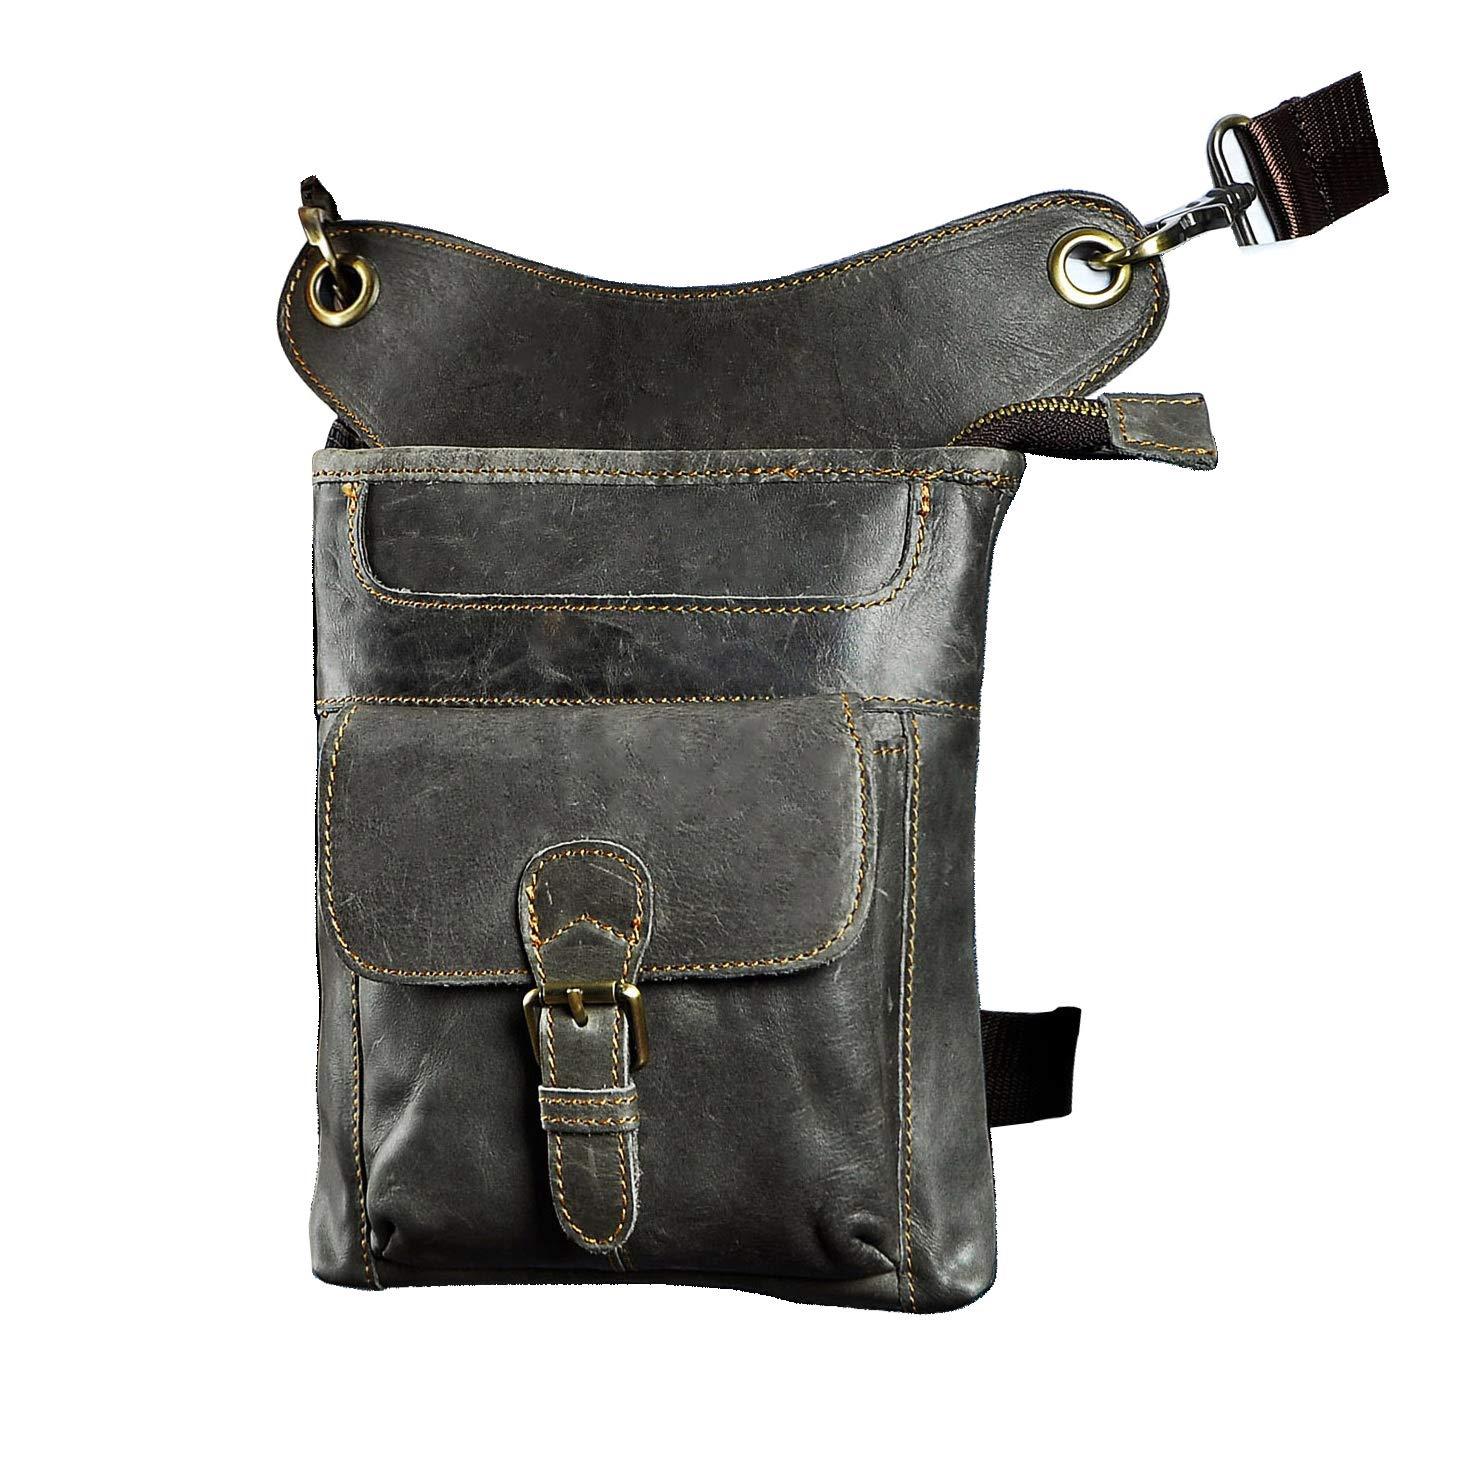 The 211-2 Grey 1 Leaokuu Mens Genuine Leather Messenger Riding Hip Bum Waist Pack Drop Leg Cross Over Bag